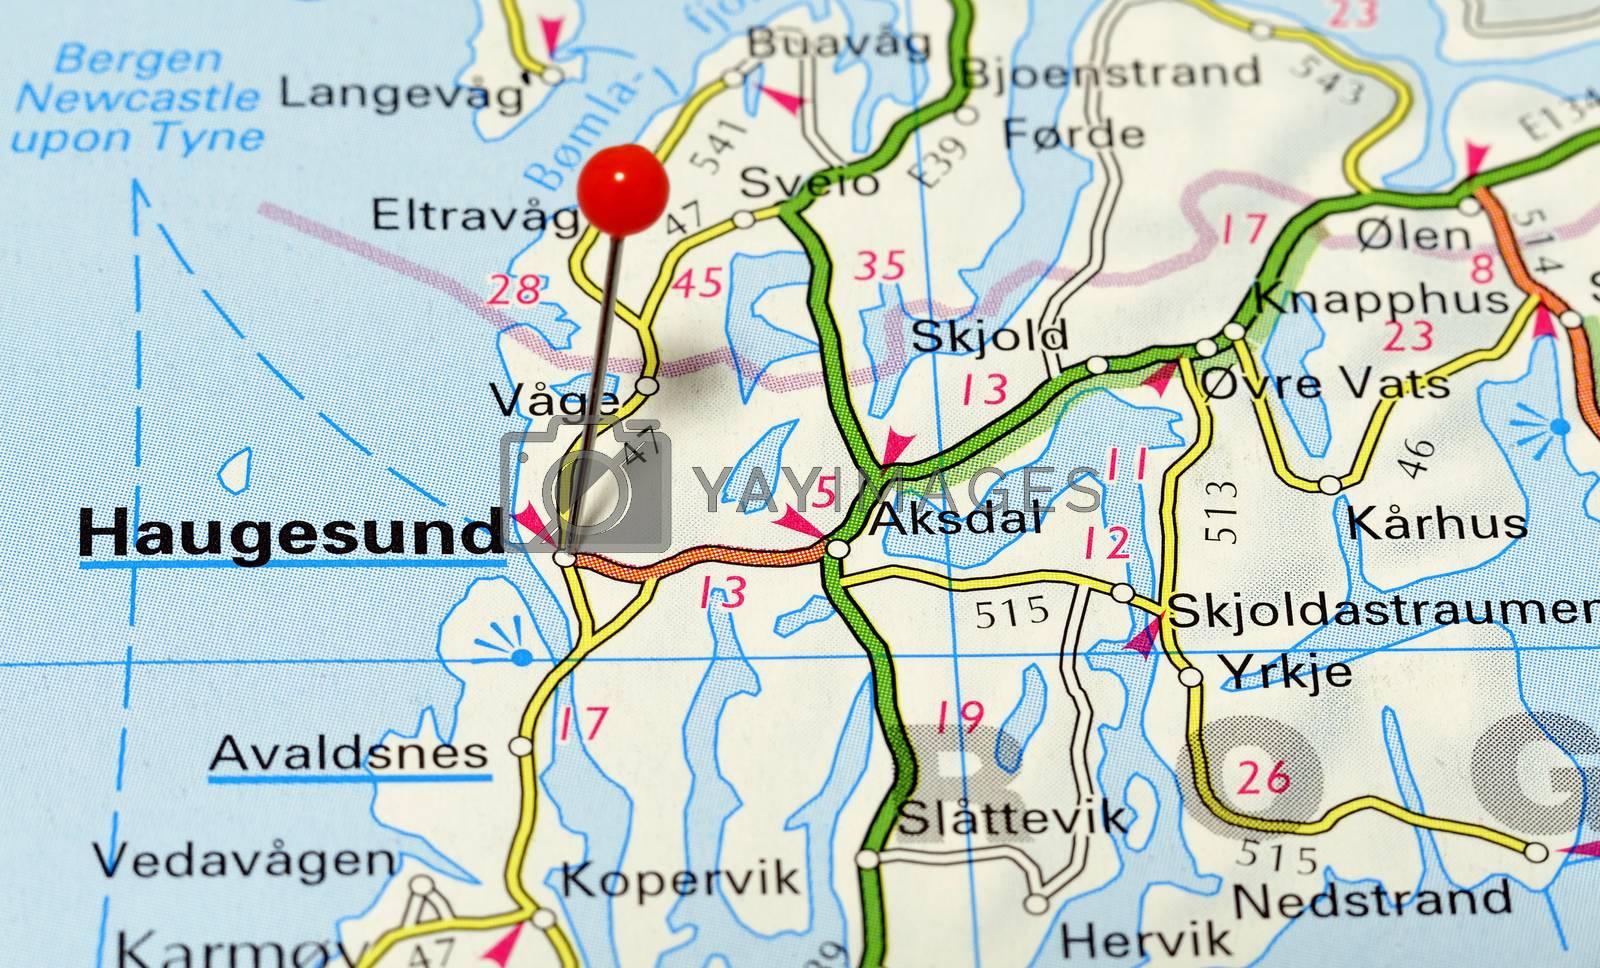 Closeup map of Hugesund. Haugesunda city in Norway.